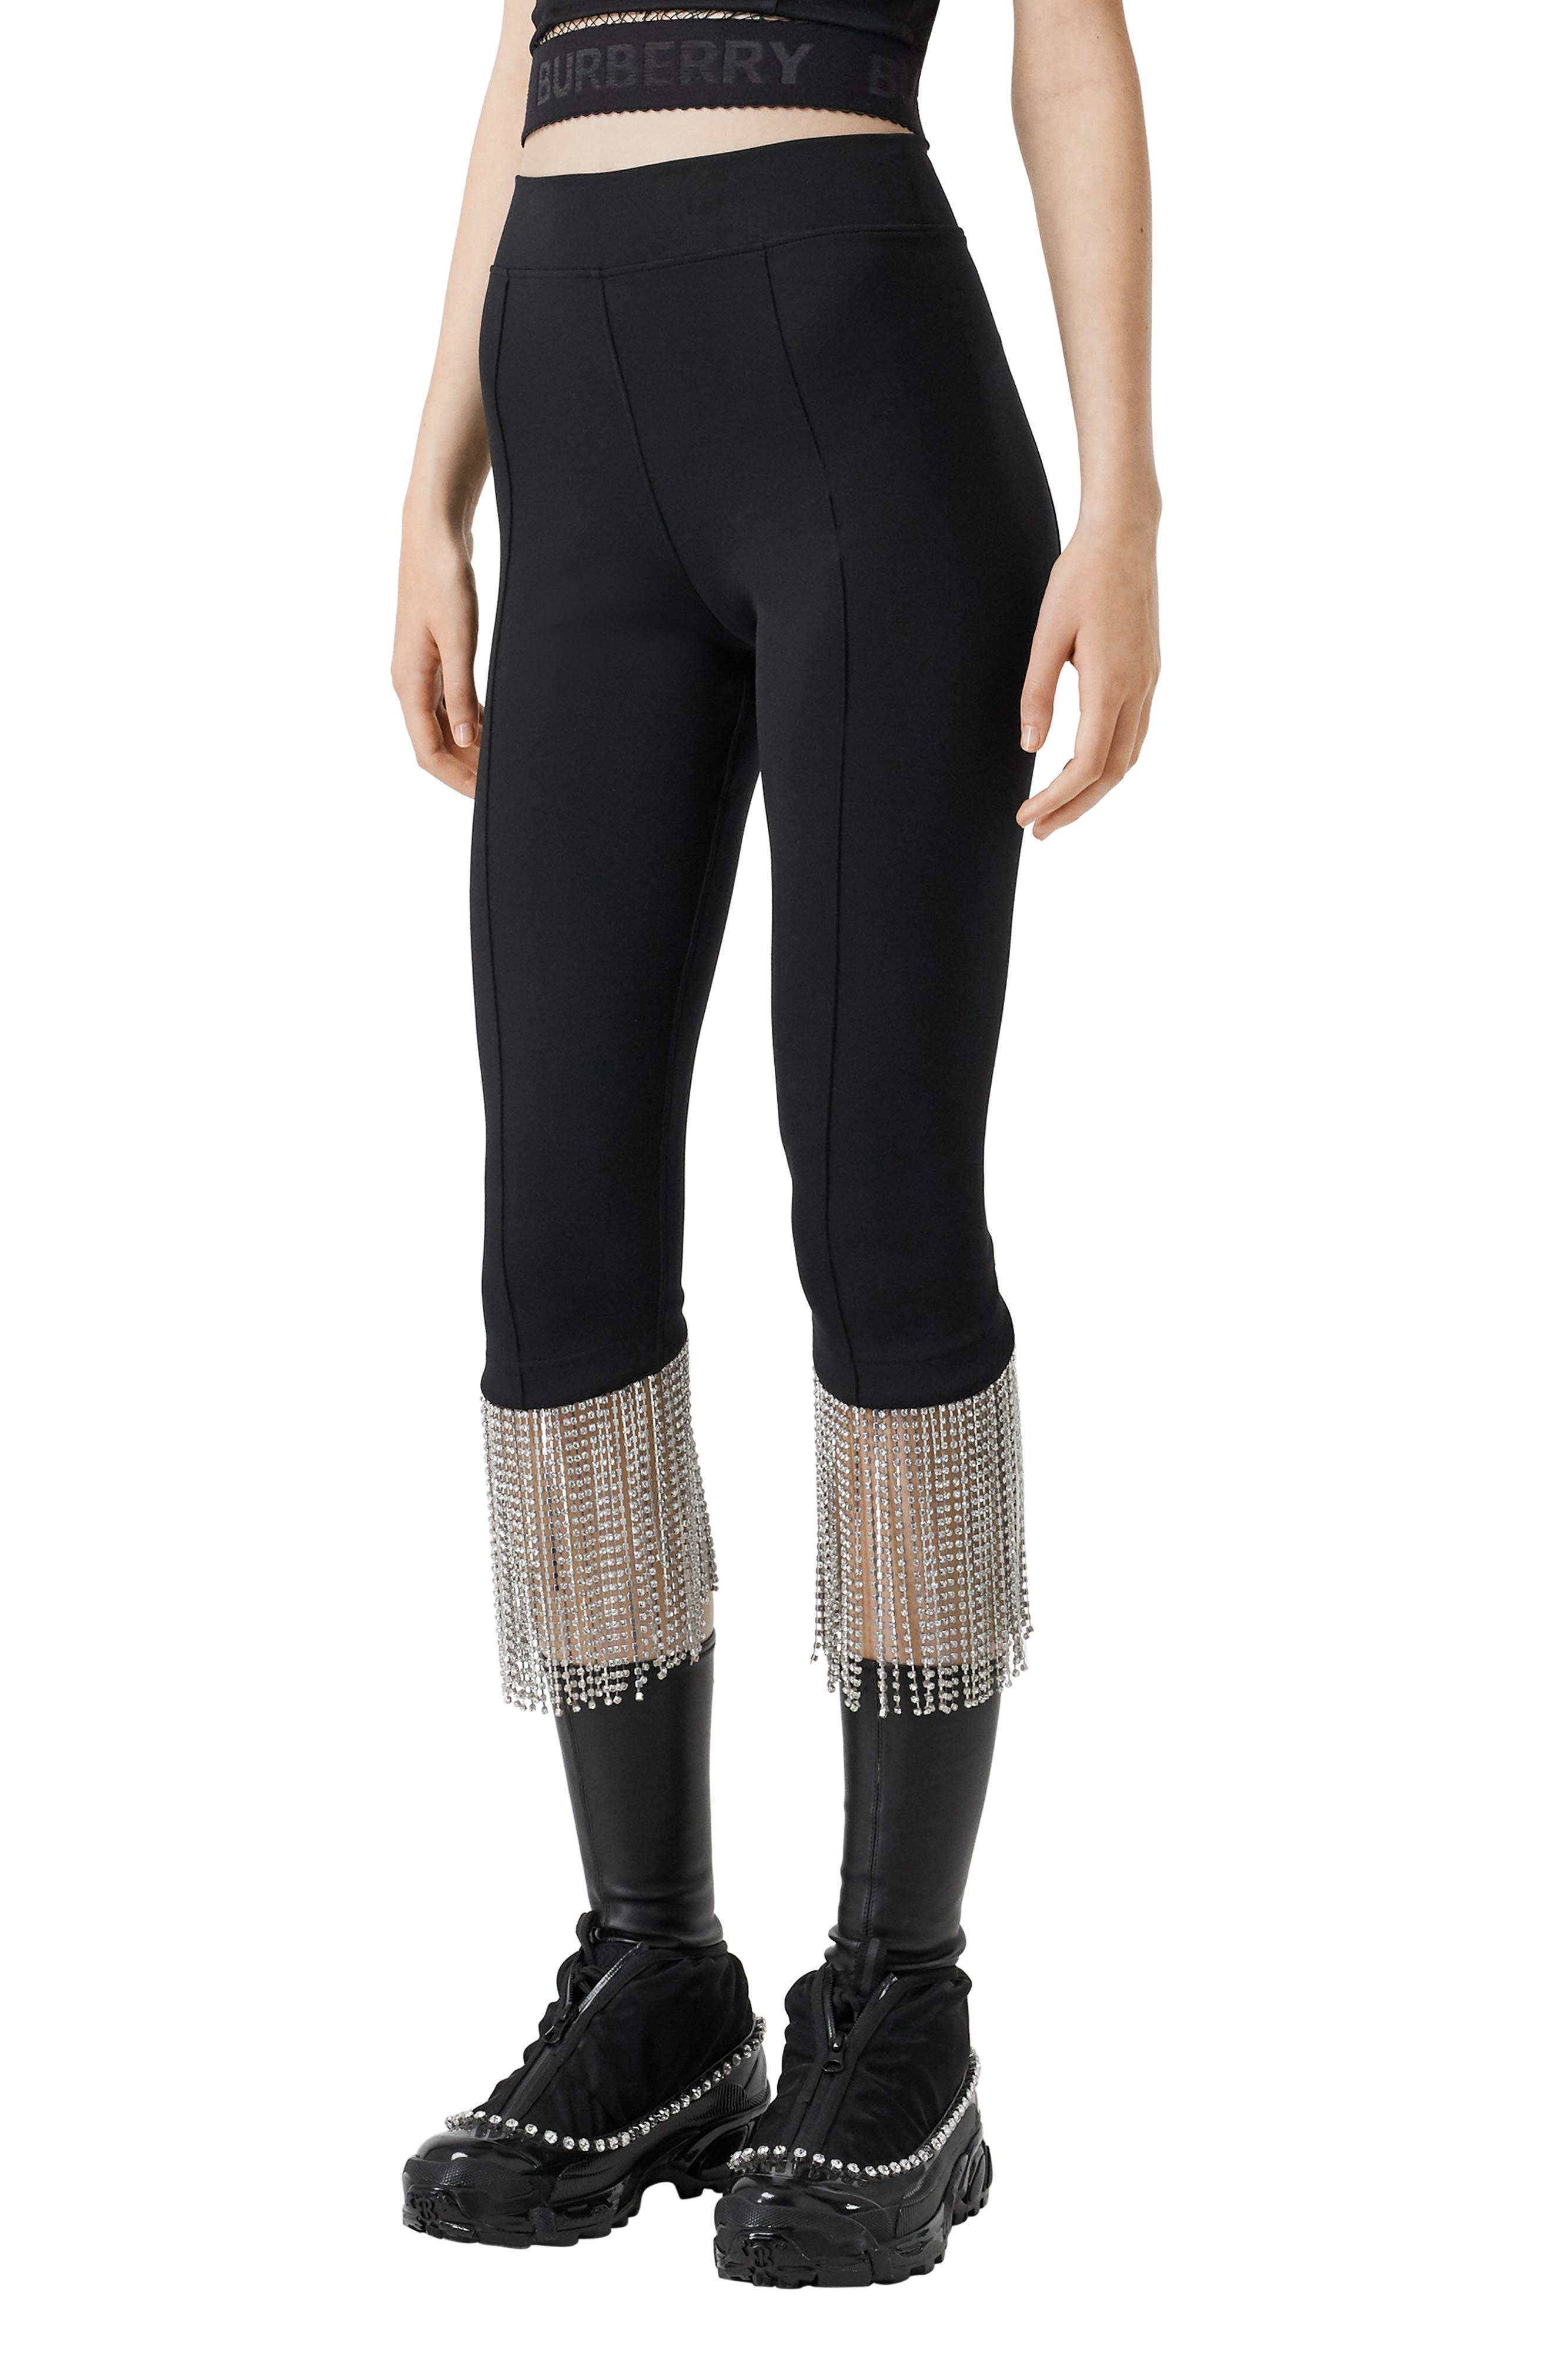 Women's Burberry Charente Crystal Fringe Crop Leggings,  Medium - Black